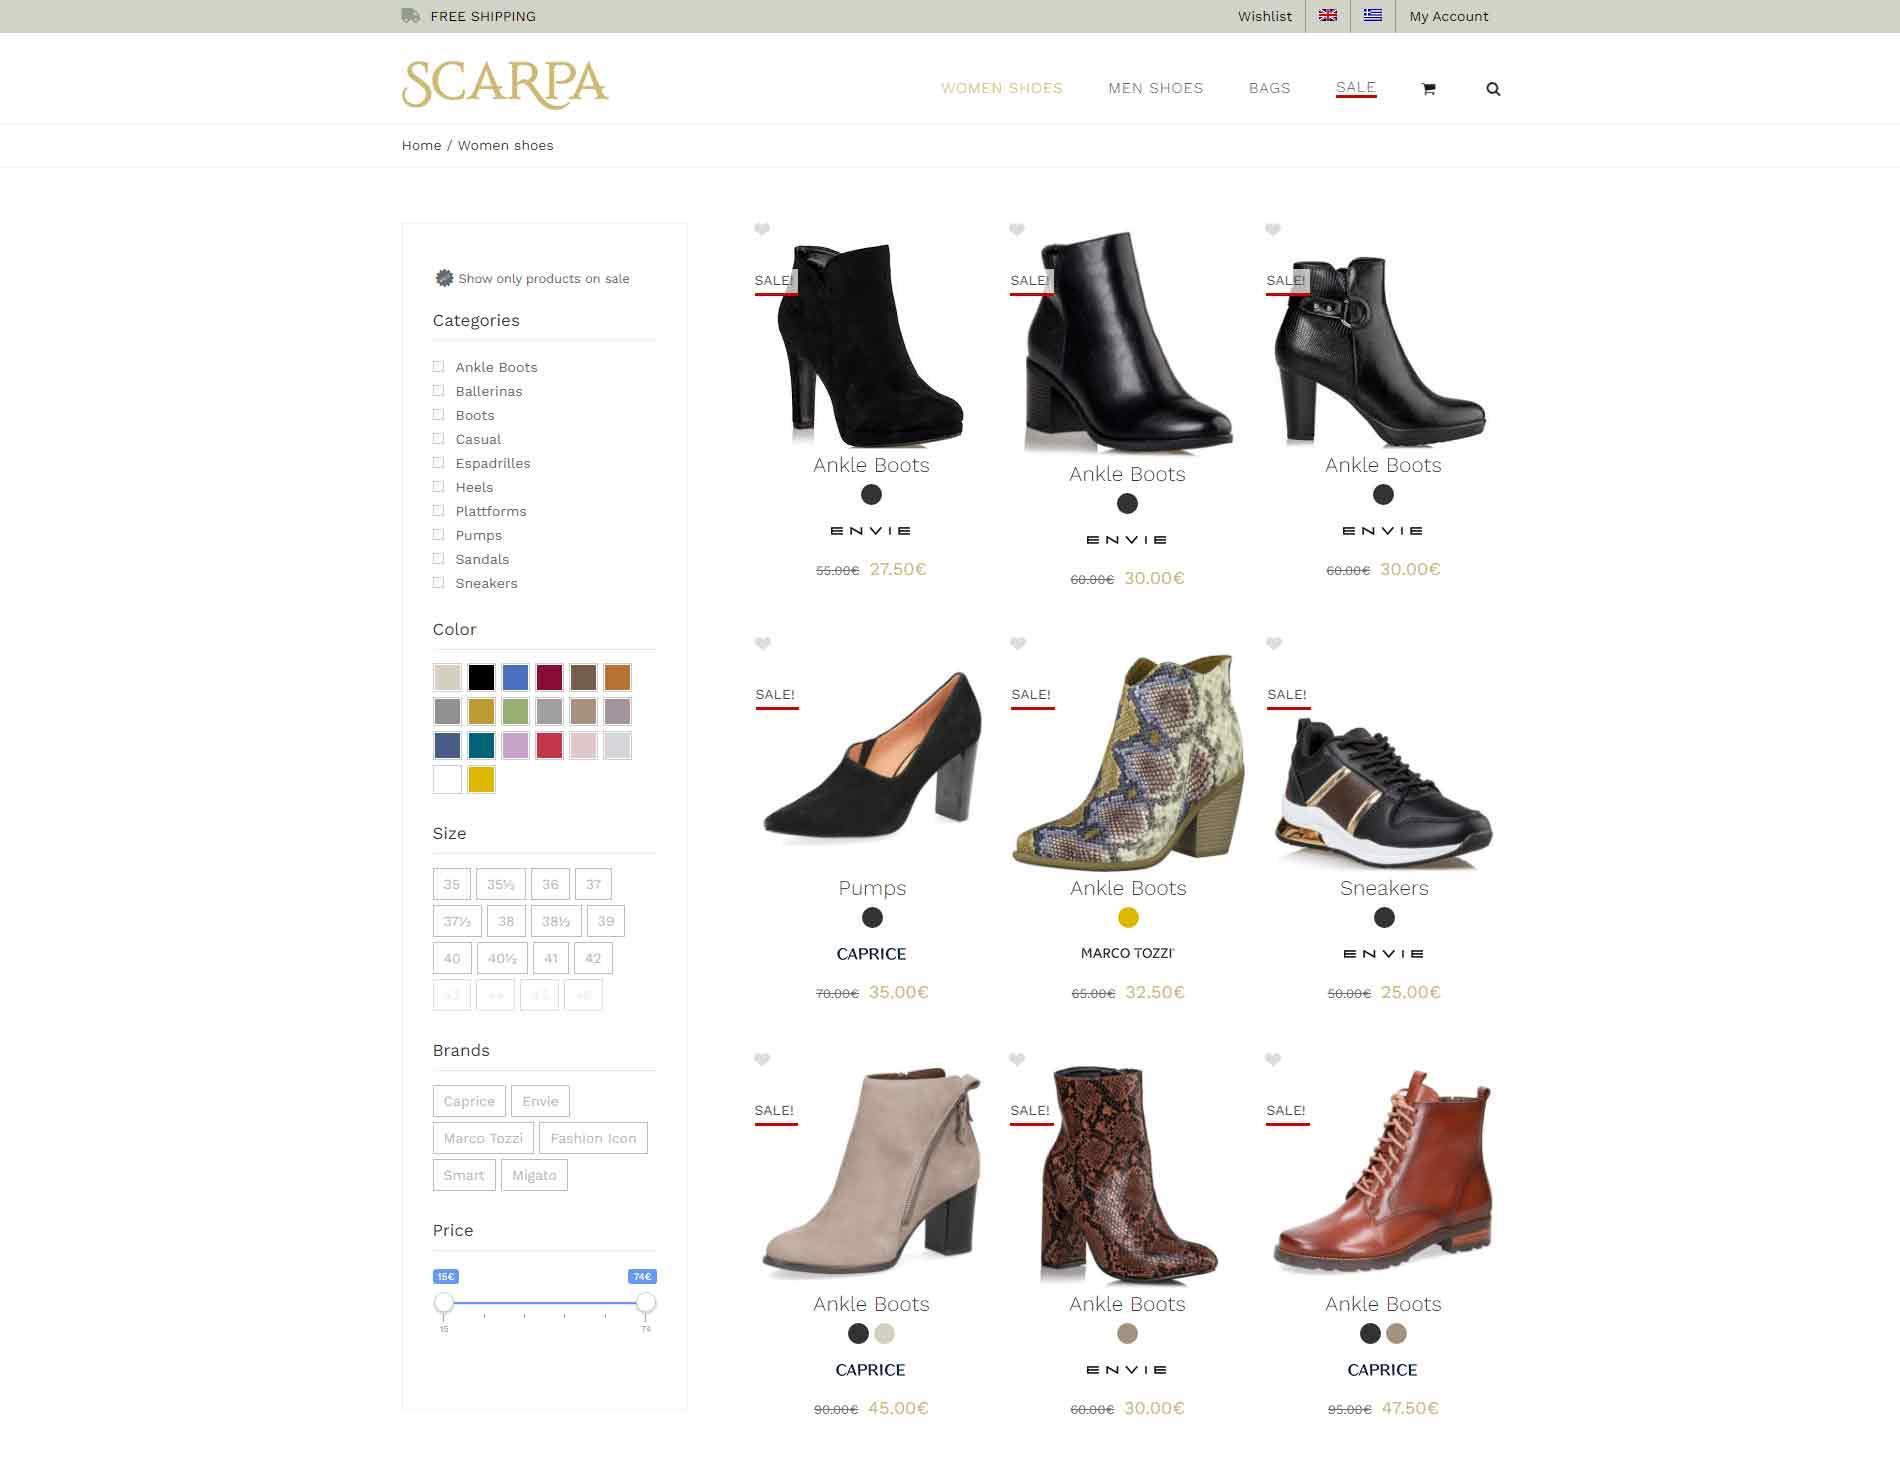 E-shop Scarpa Magazino Shoes Accessories Bags